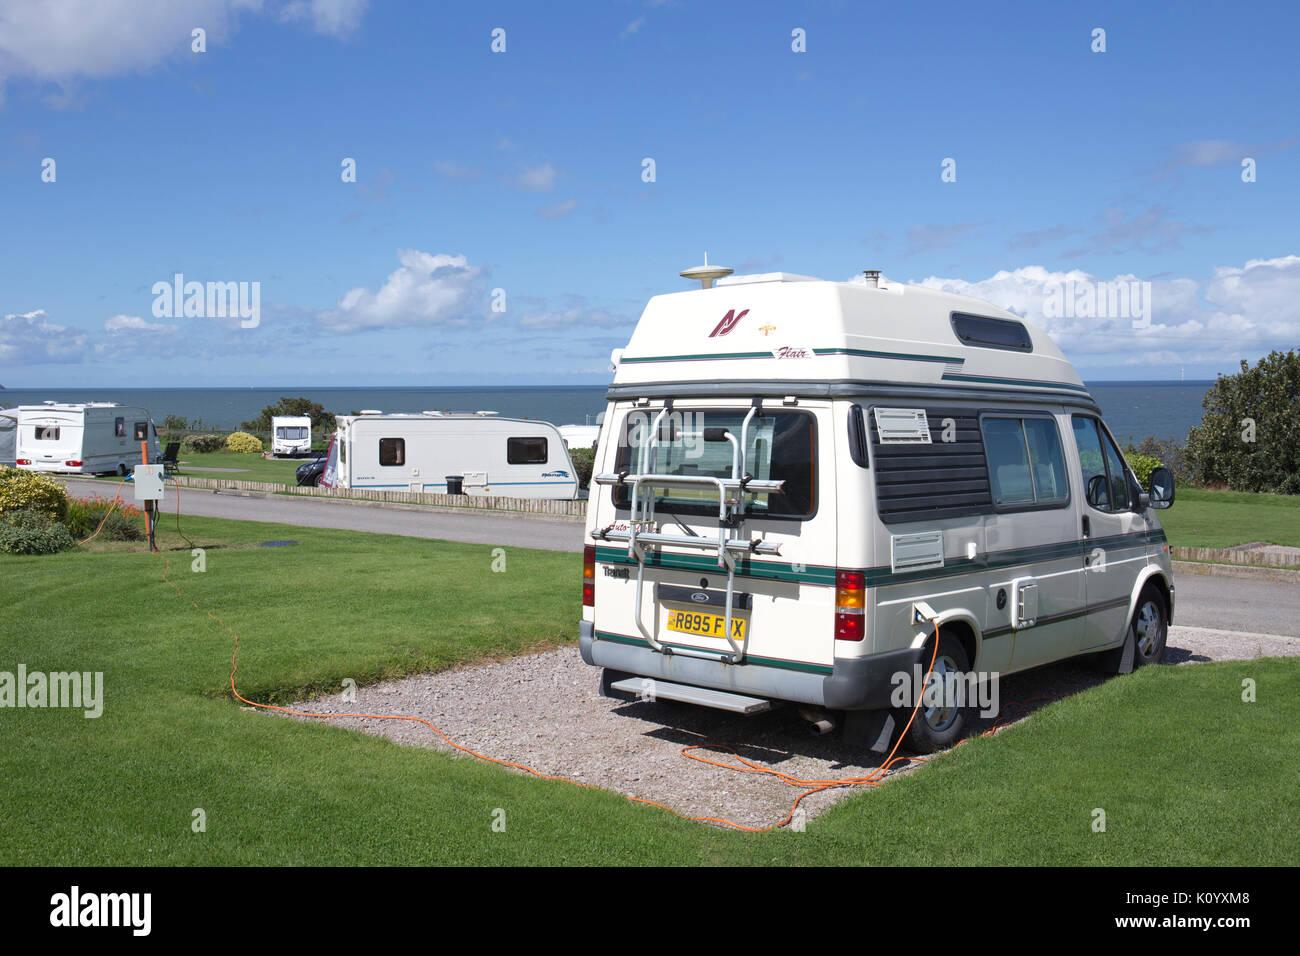 Flair Ford auto sleeper sur Bron-Y-Wendon camping dans Llandddulas Wales UK Photo Stock